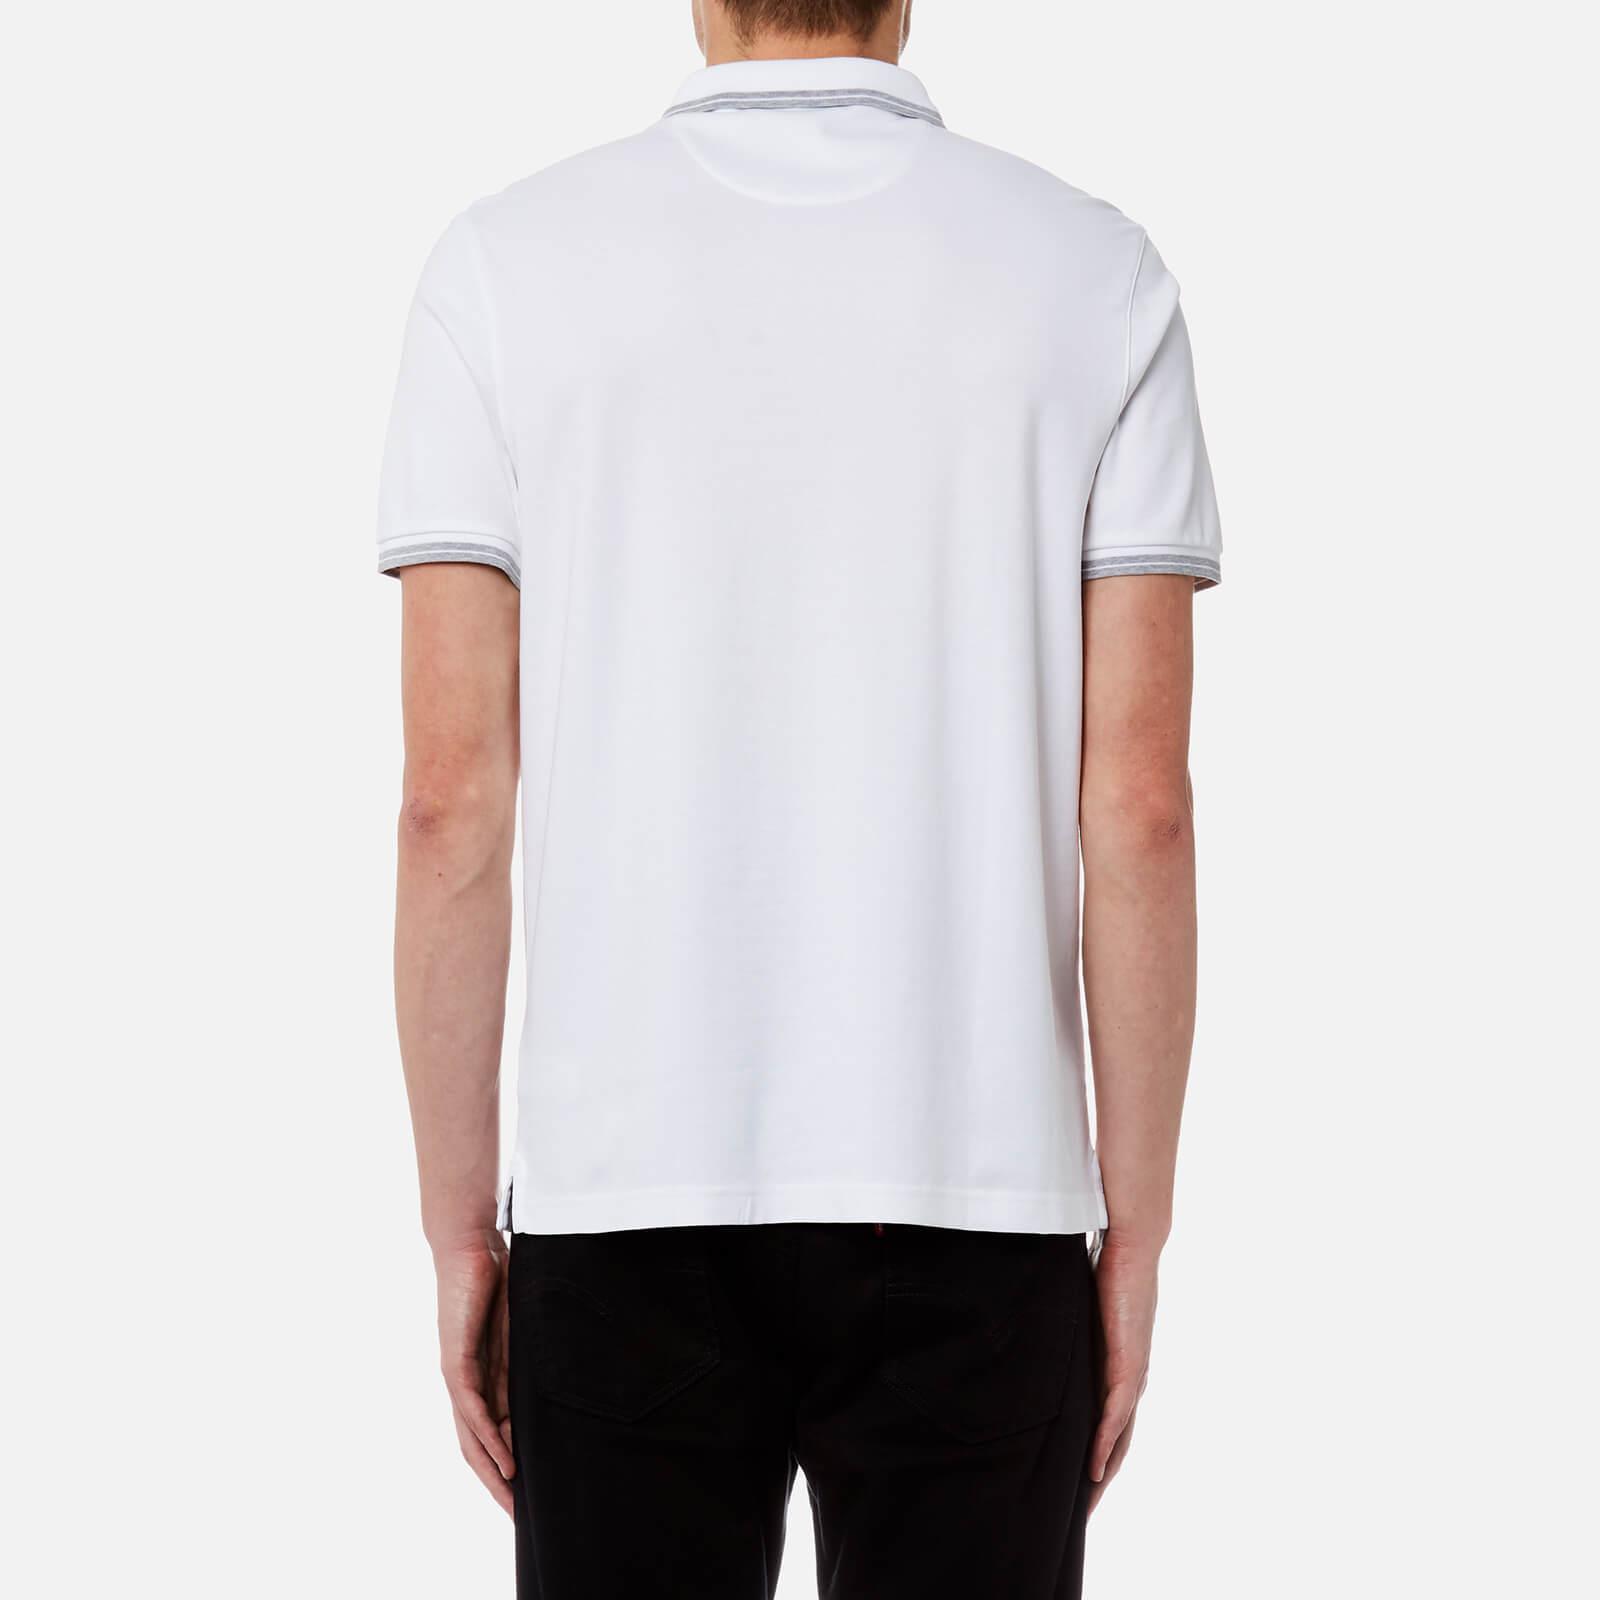 da1e3582 Michael Kors - White Greenwich Logo Jacquard Short Sleeve Polo Shirt for Men  - Lyst. View fullscreen